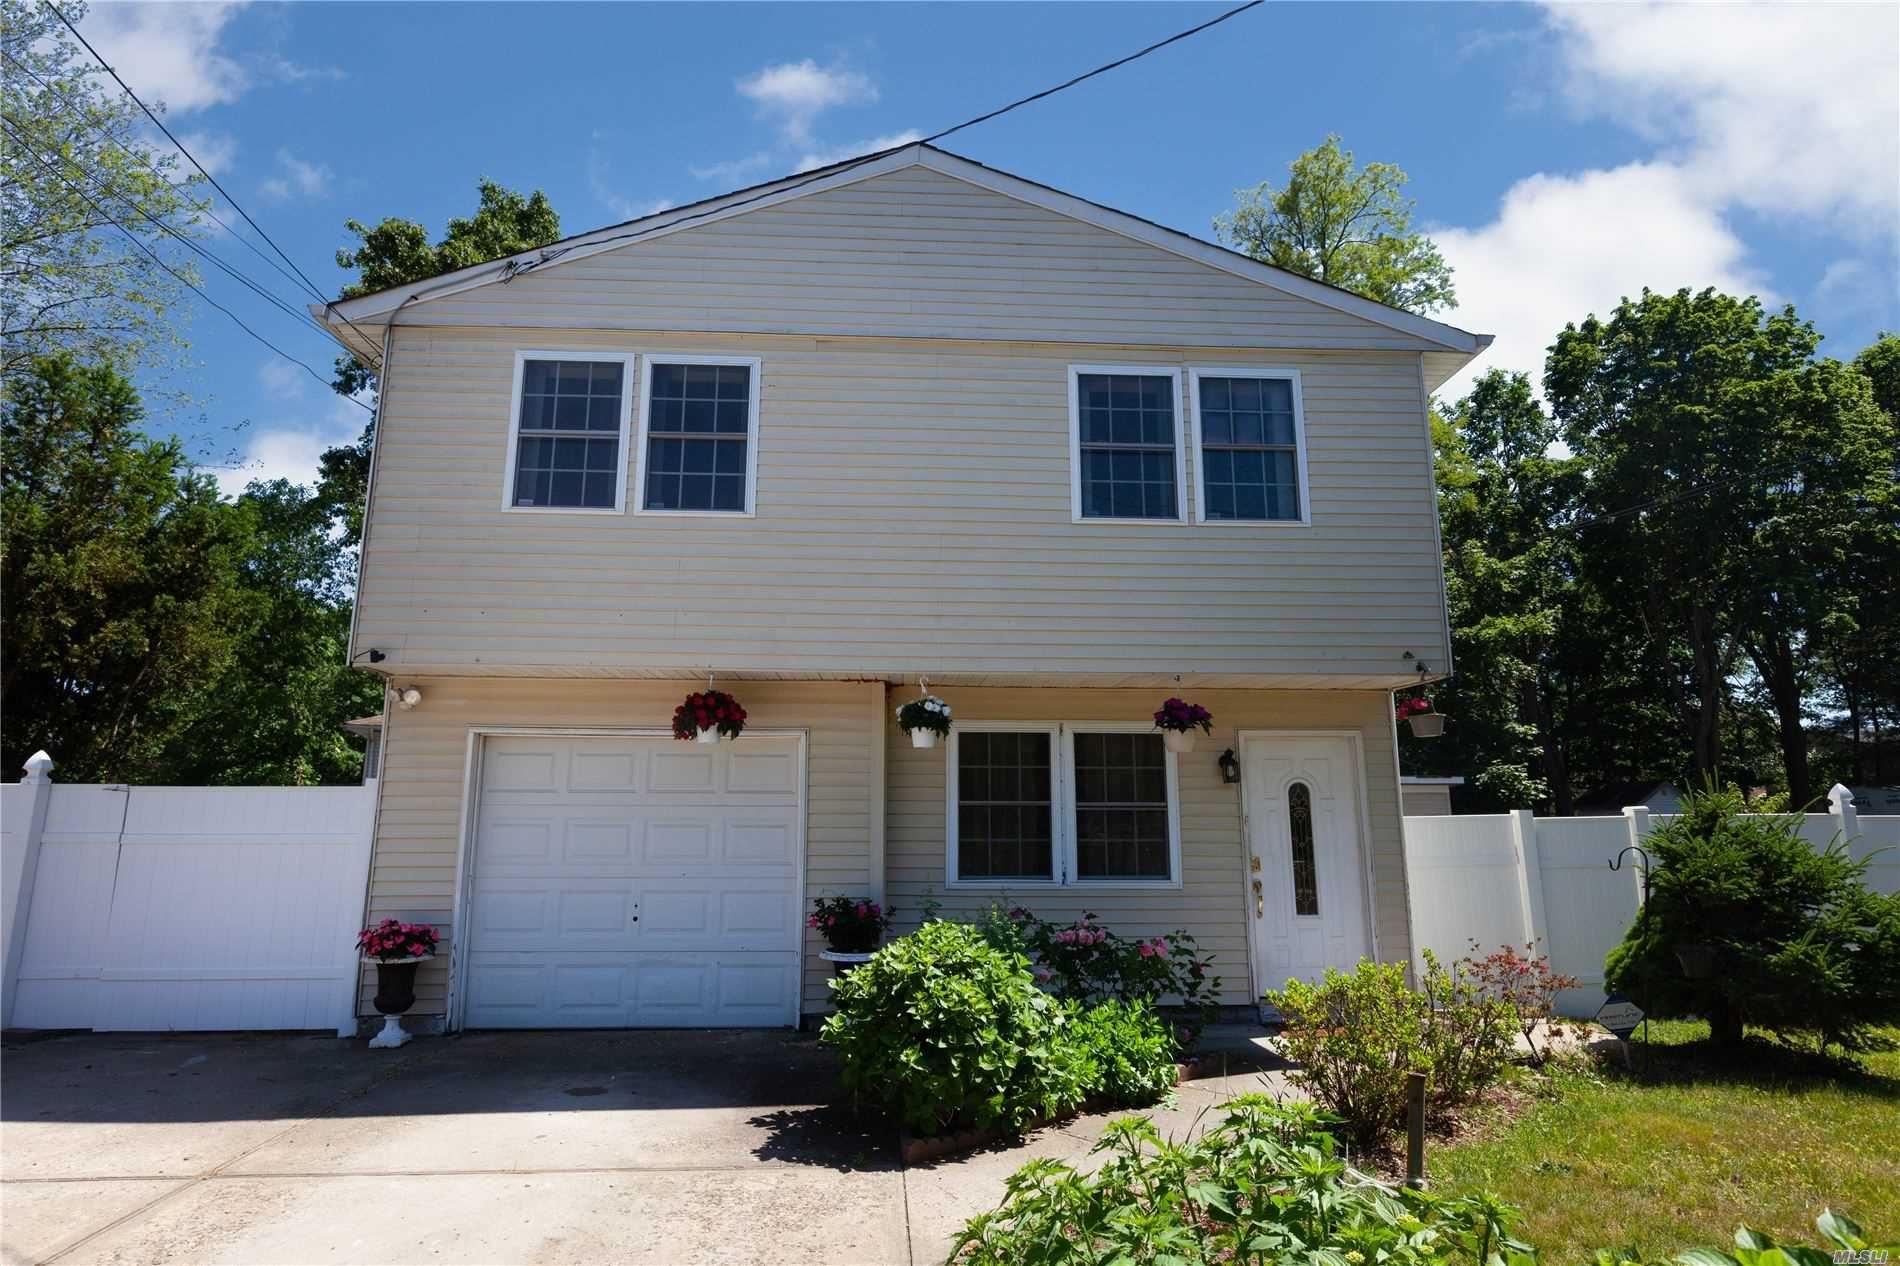 194 Noble Street, Brentwood, NY 11717 - MLS#: 3220483